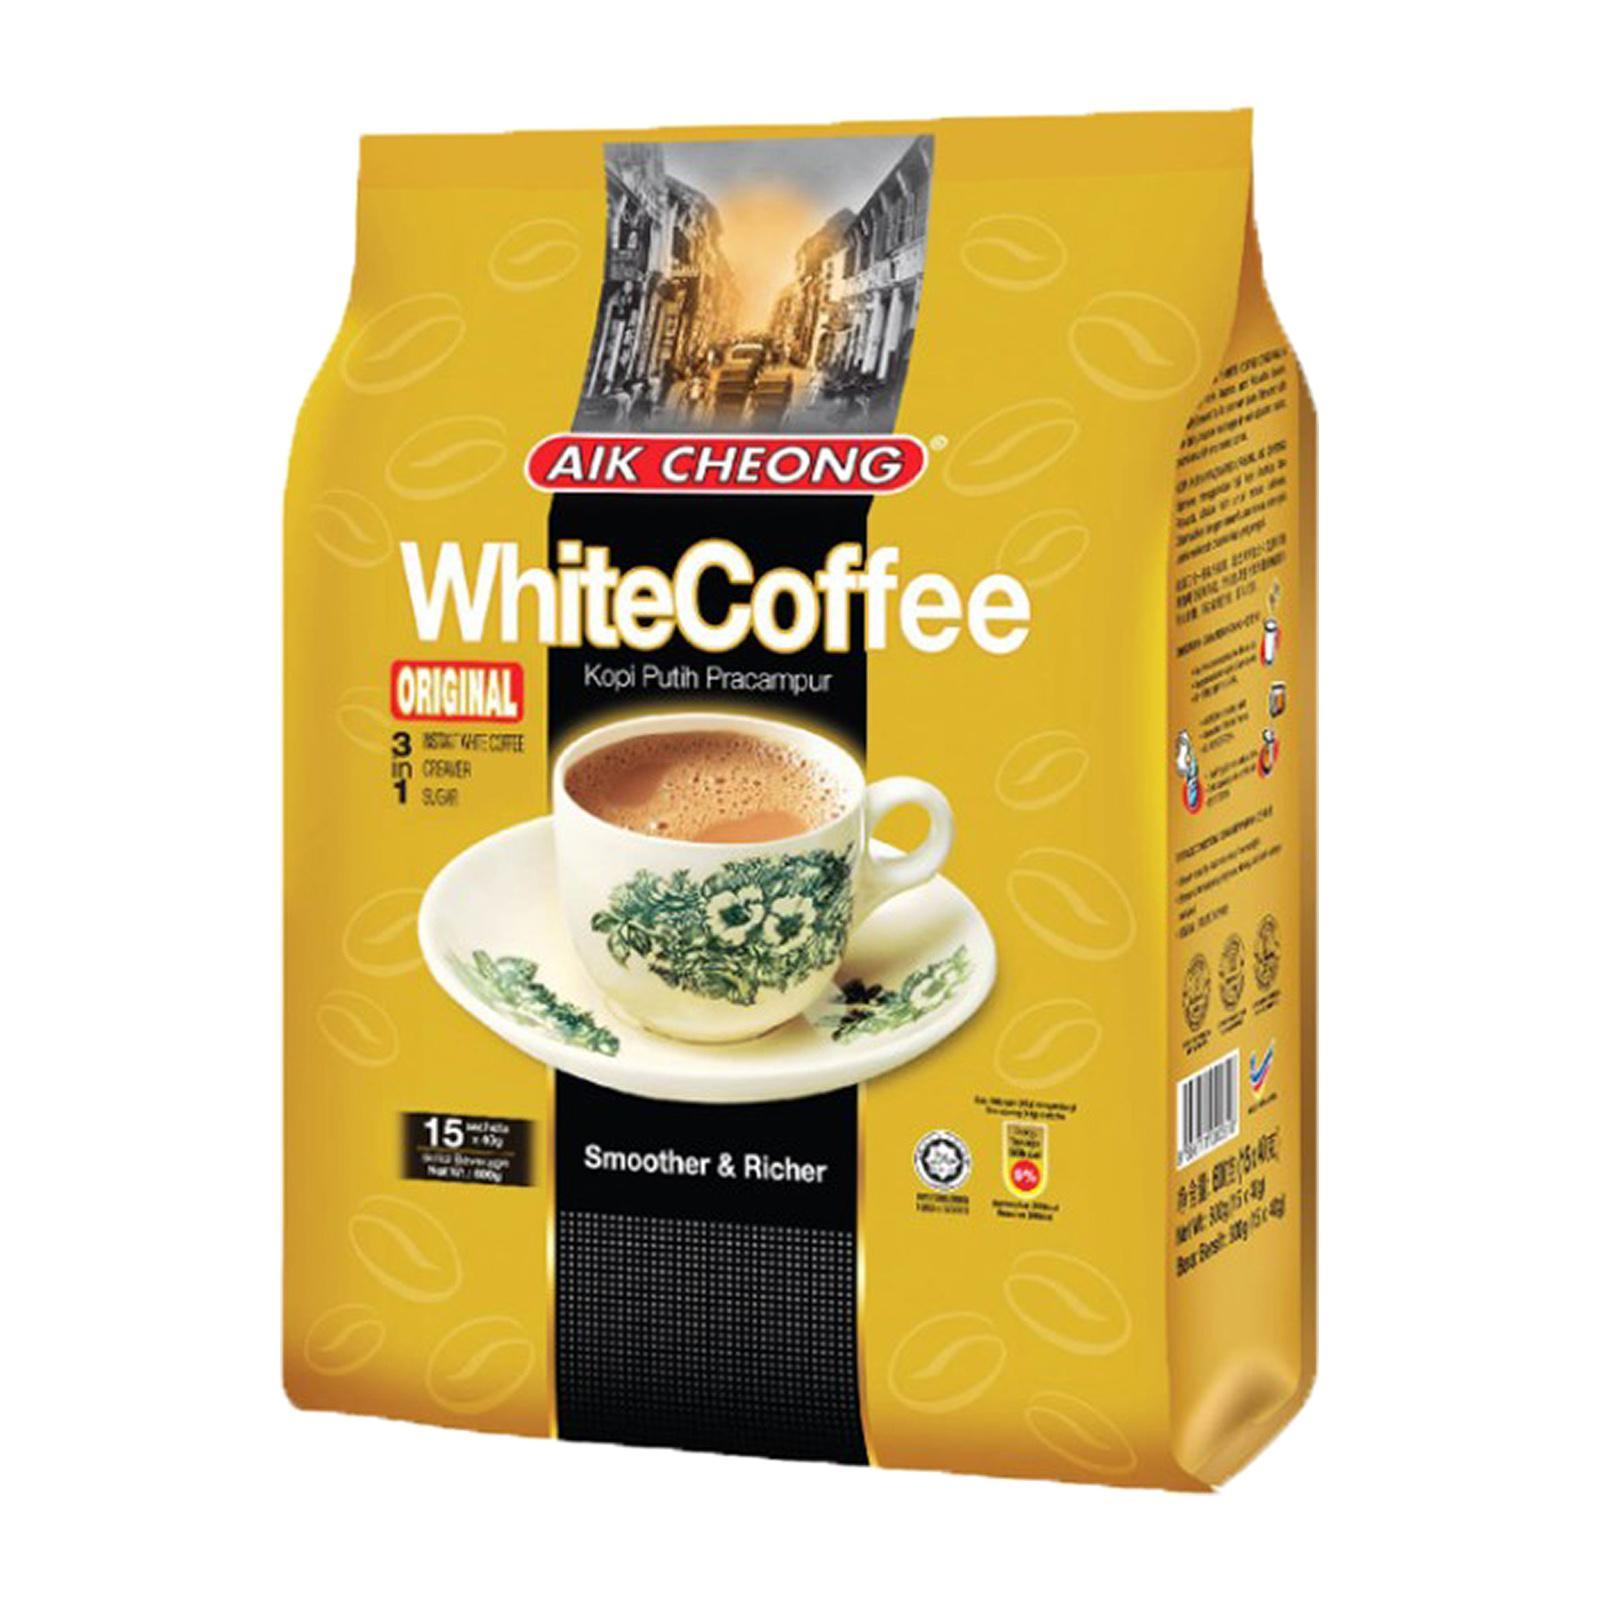 Aik Cheong 3 In 1 White Coffee Original